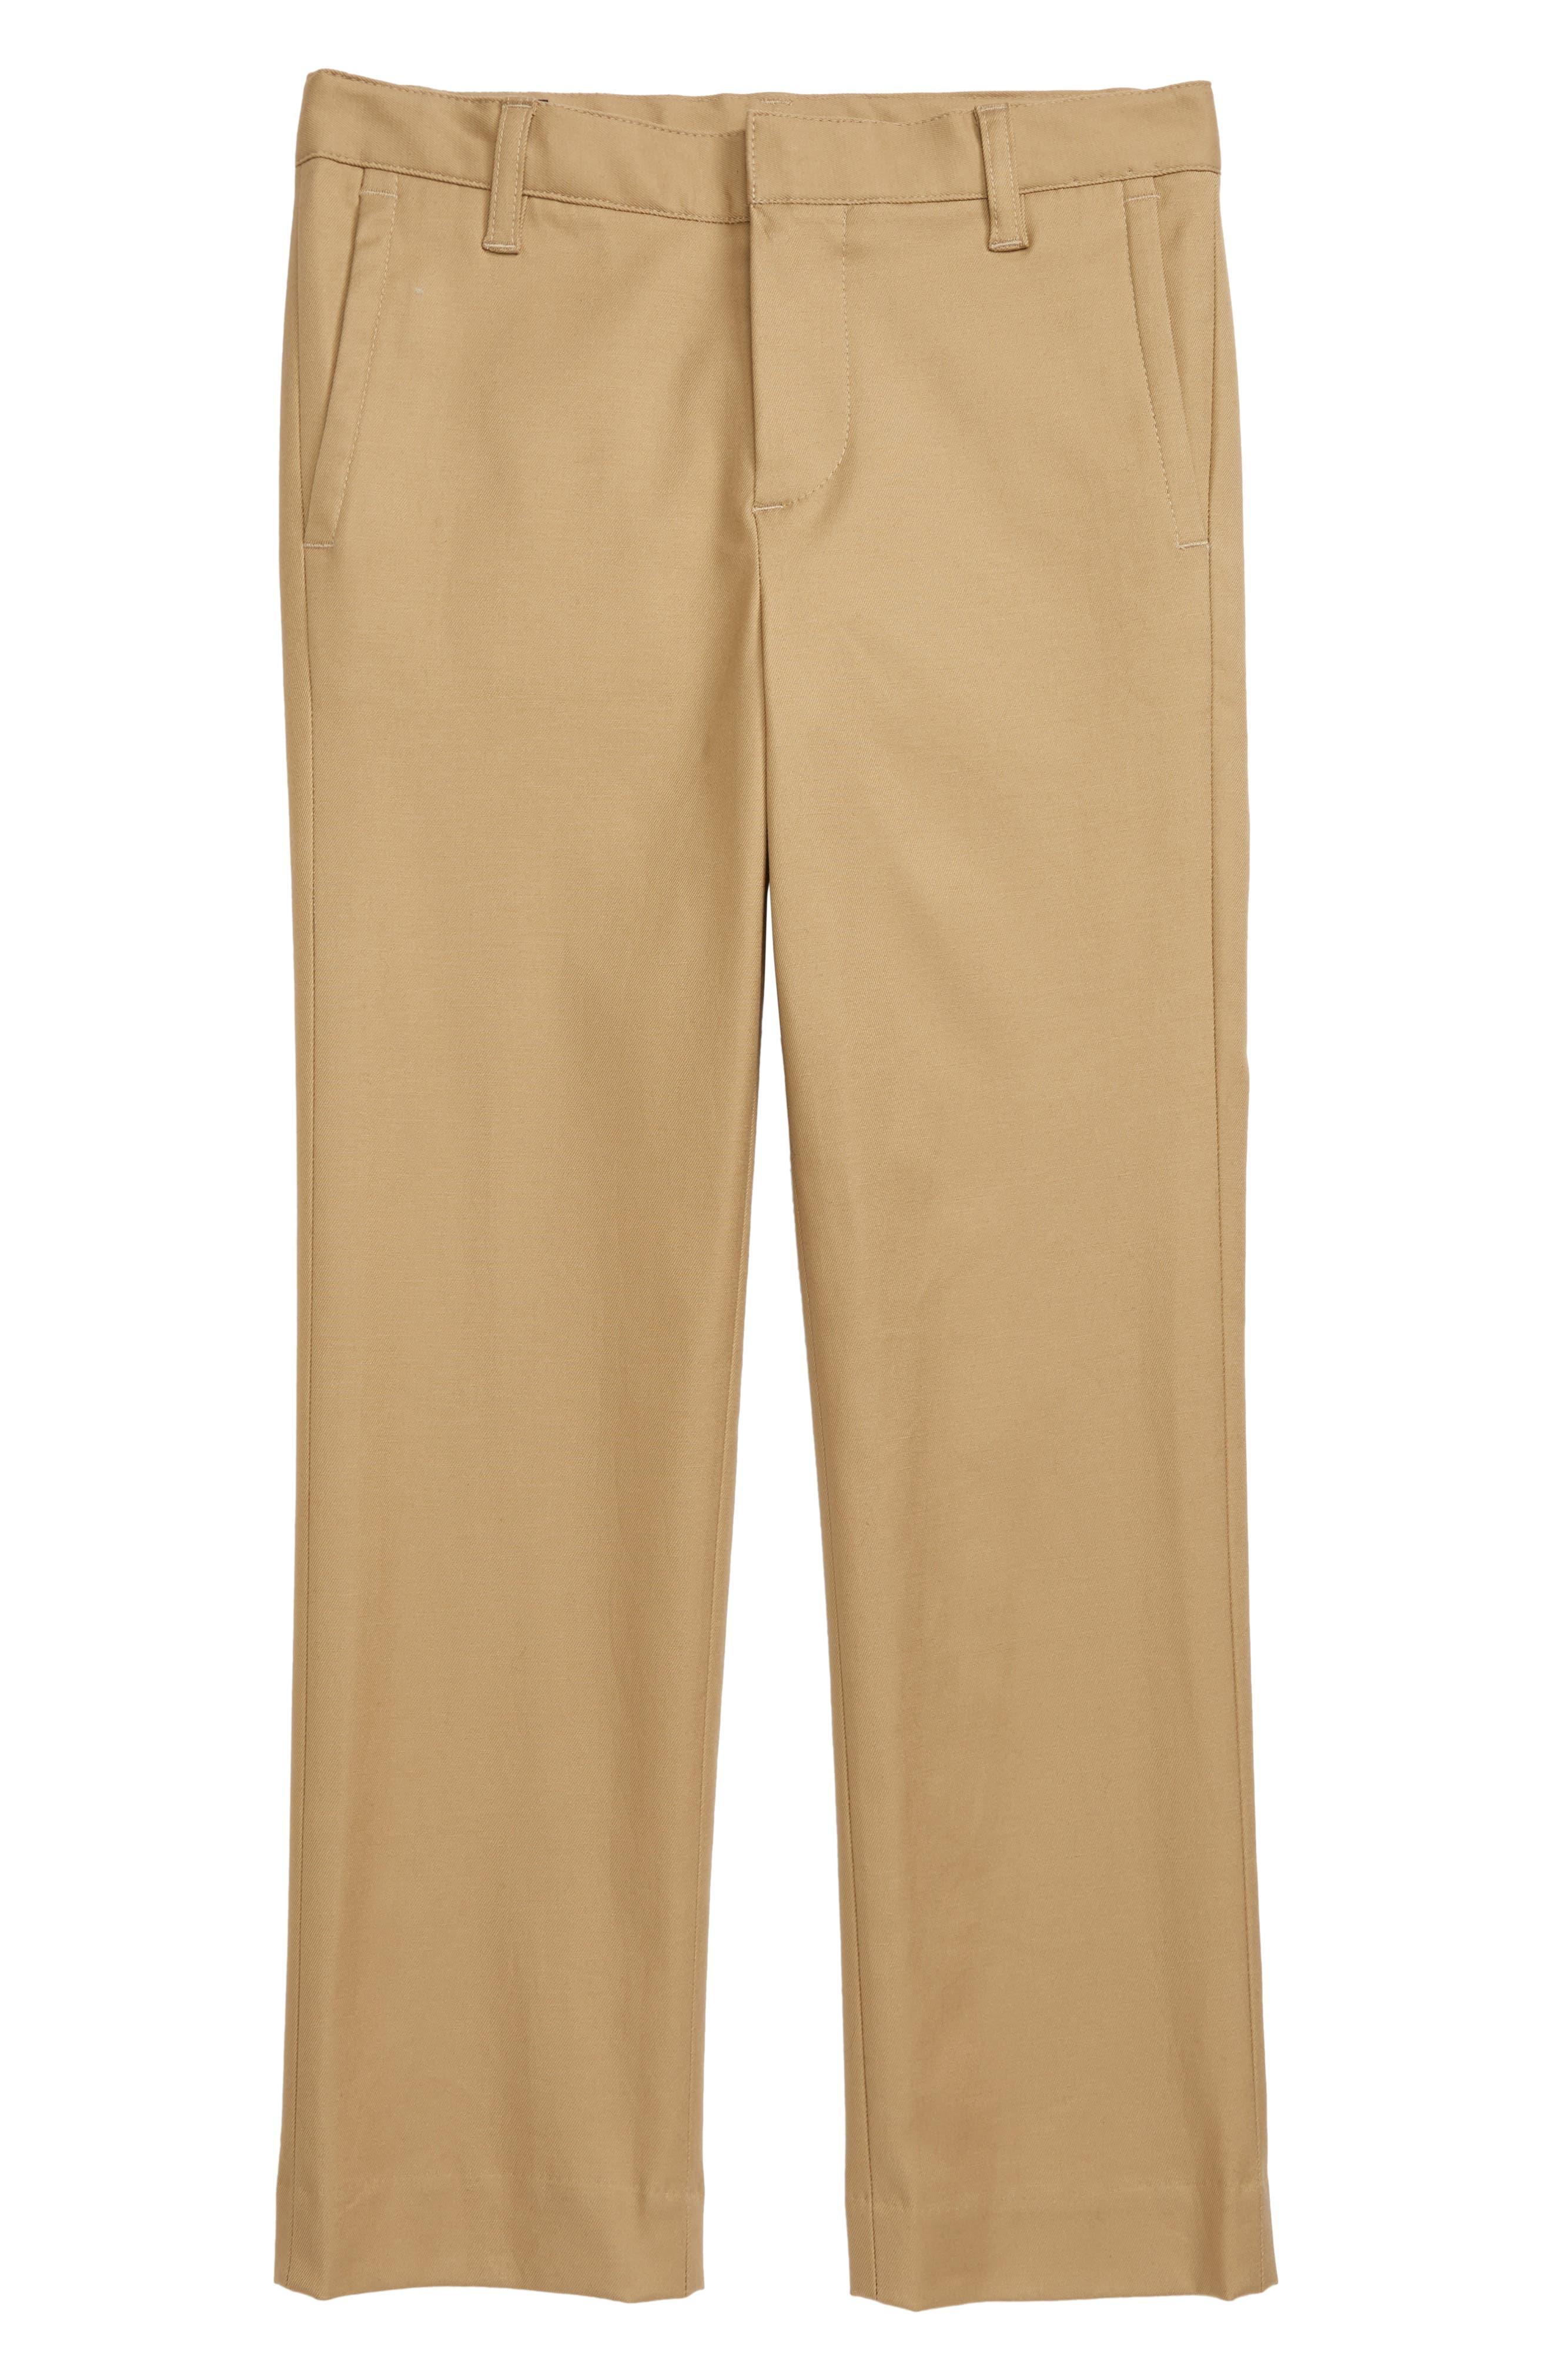 Image of Nordstrom Flat Front Dress Pants